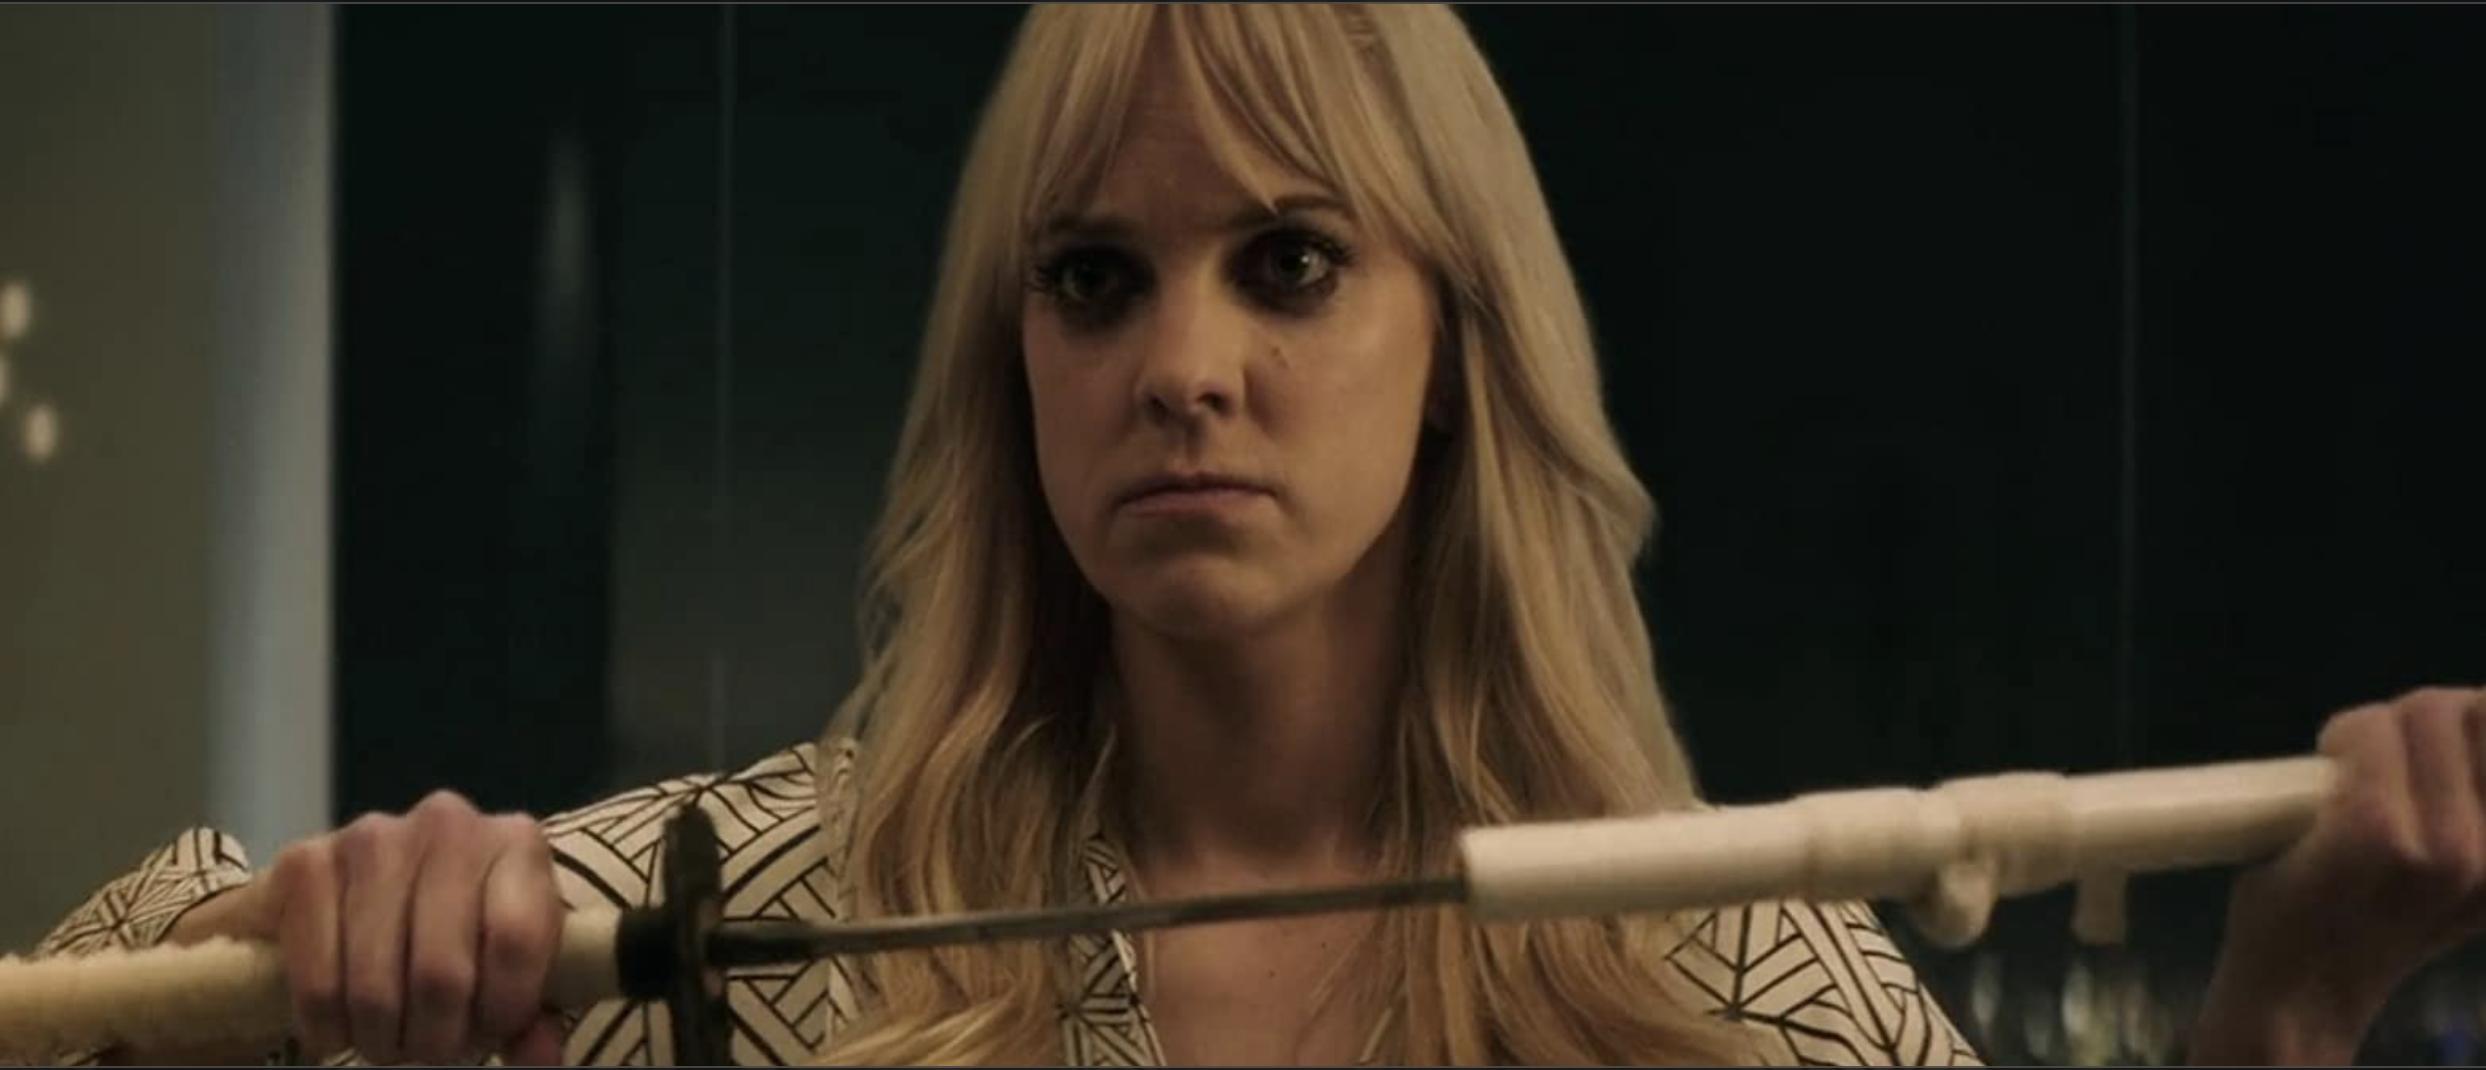 A wild-eyed Anna Farris unsheathing a Japanese sword